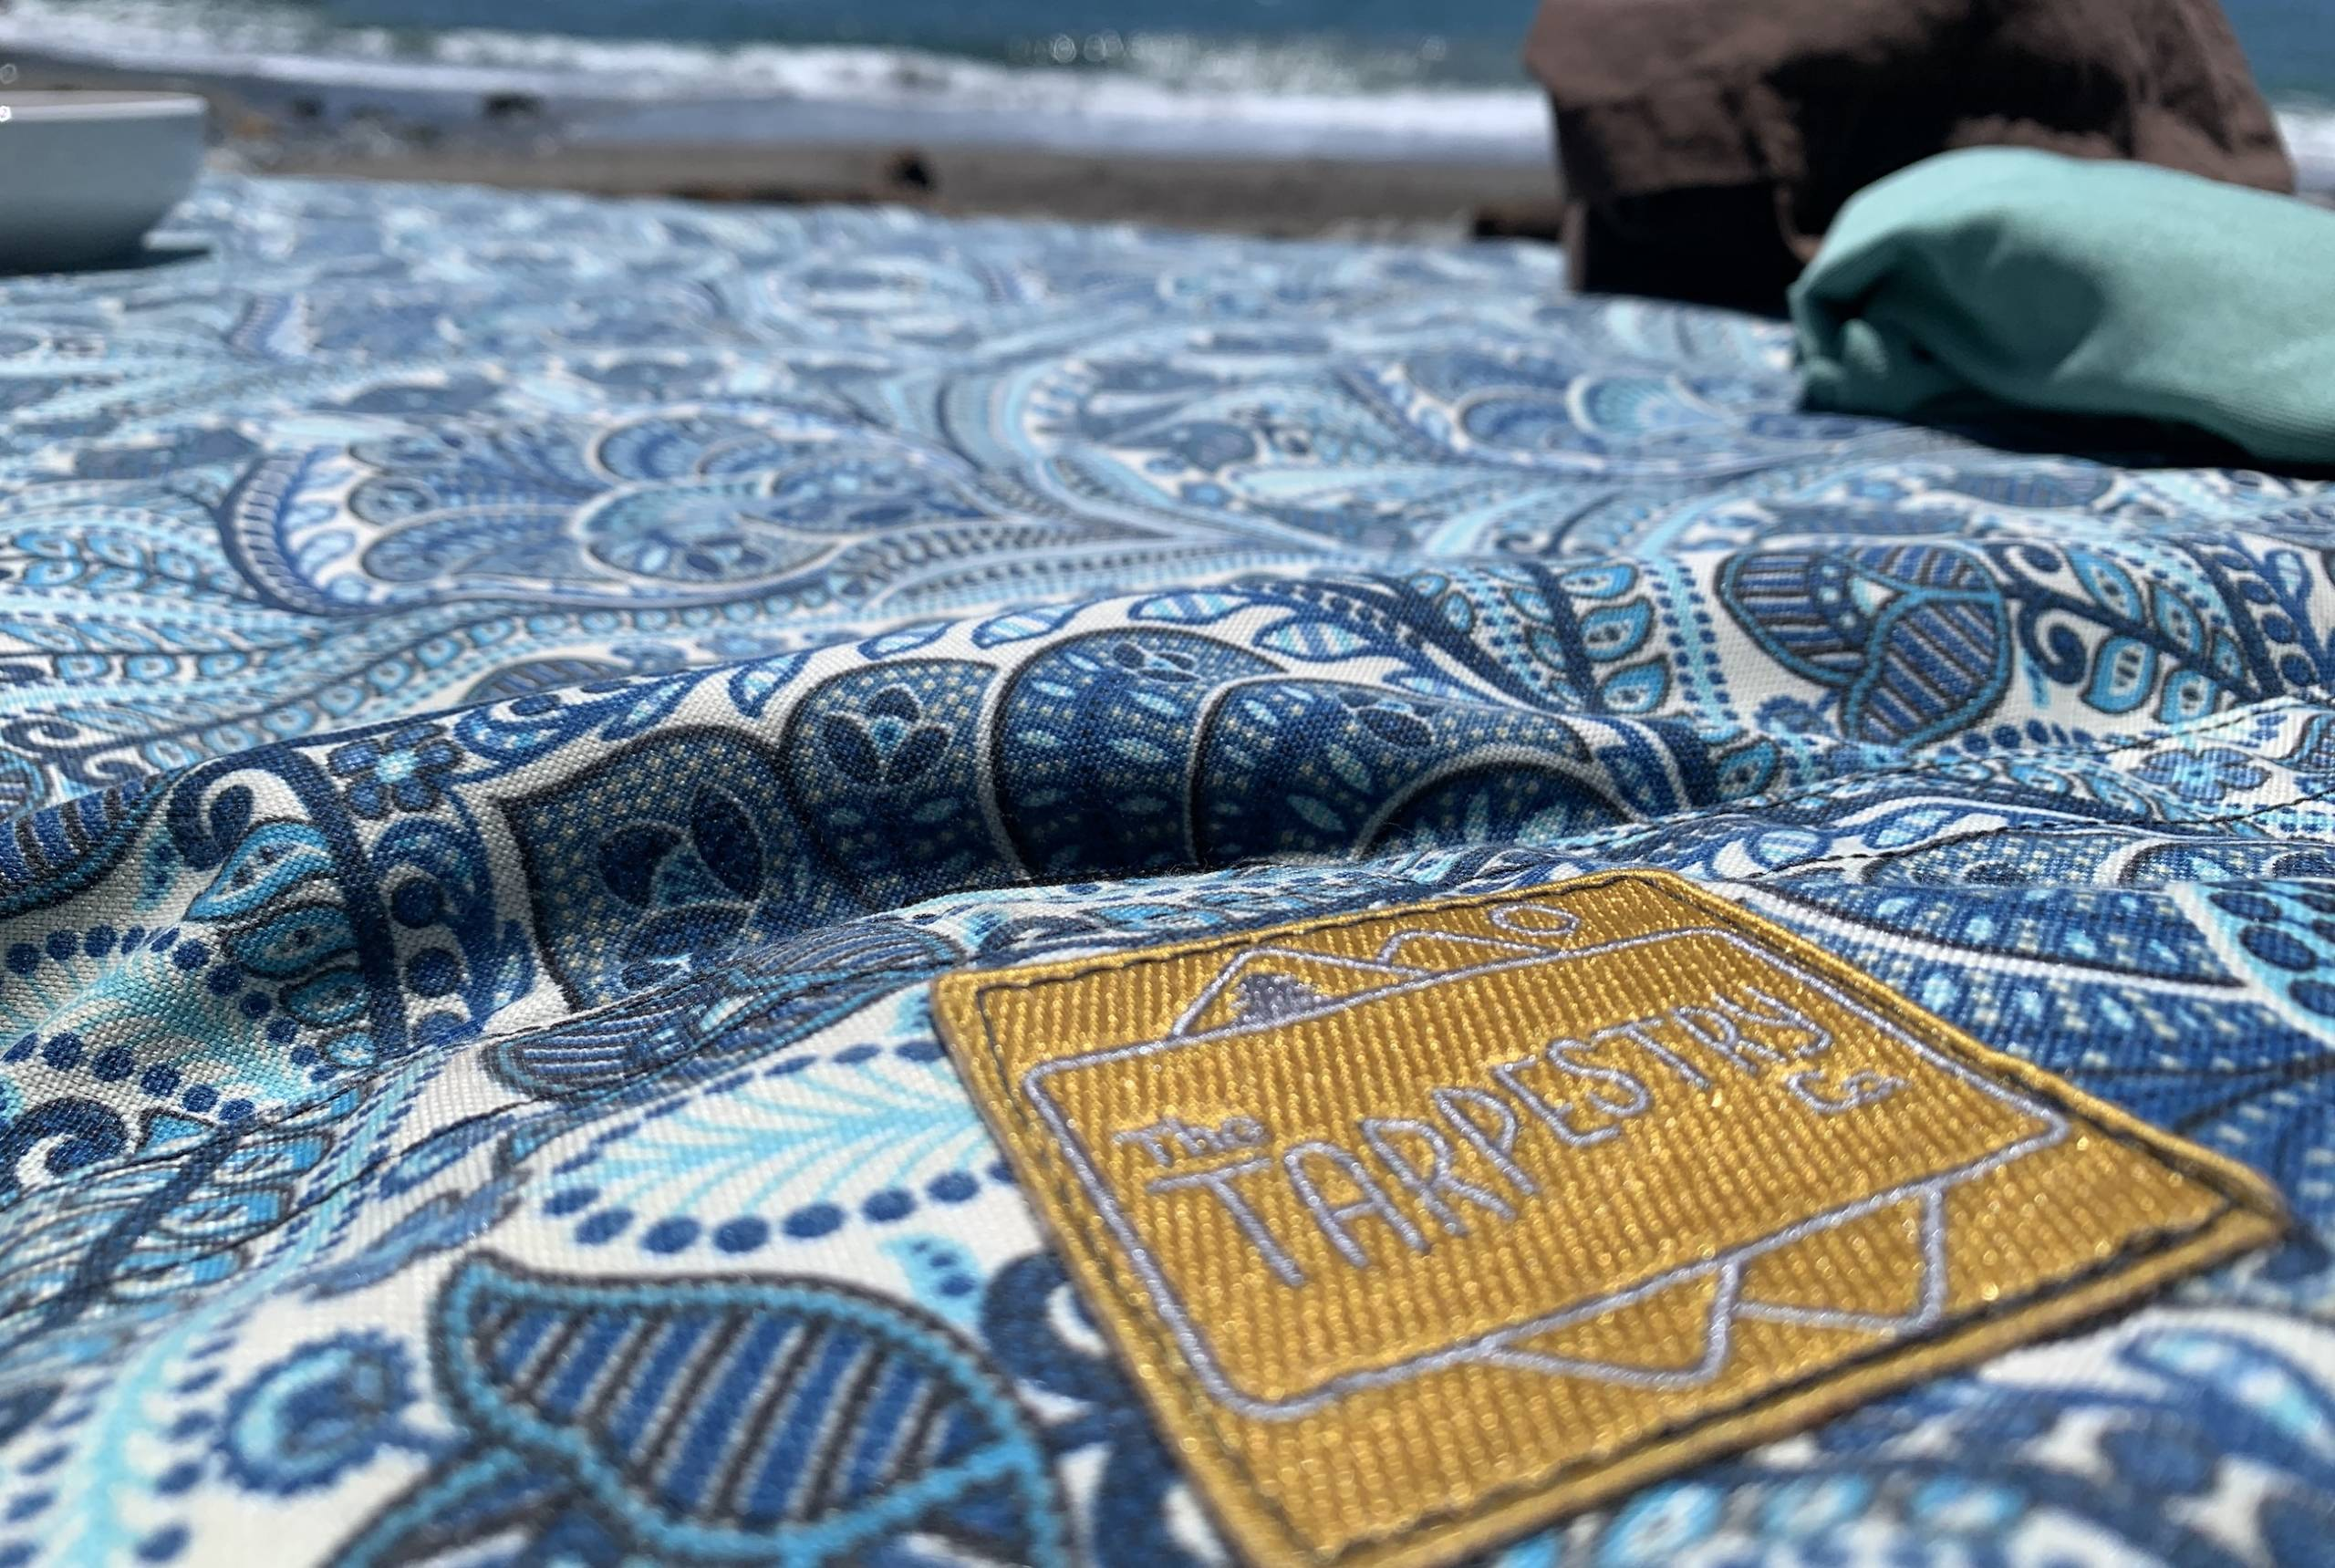 a tarpestry blanket on the beach